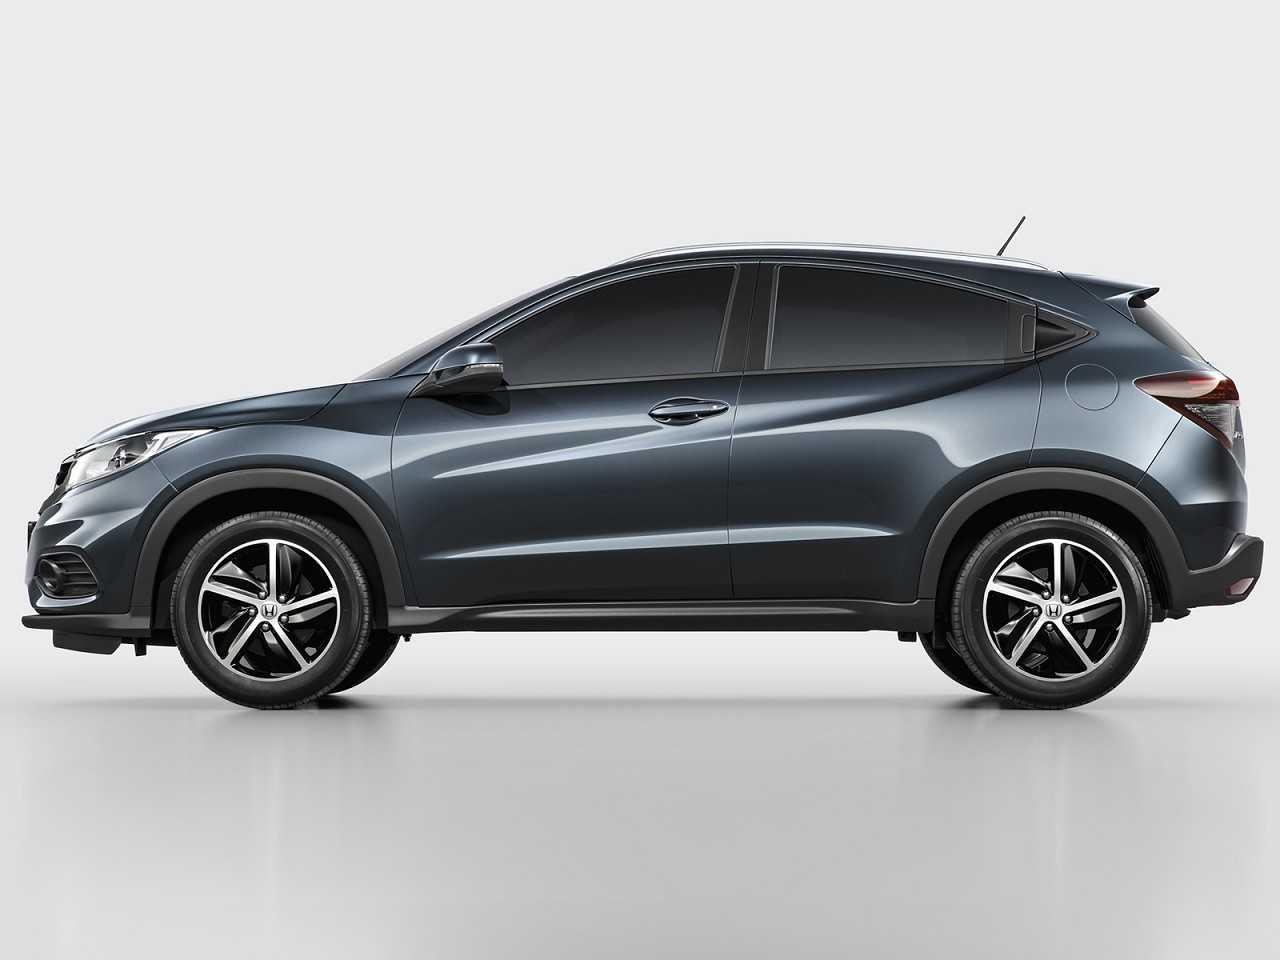 HondaHR-V 2019 - lateral